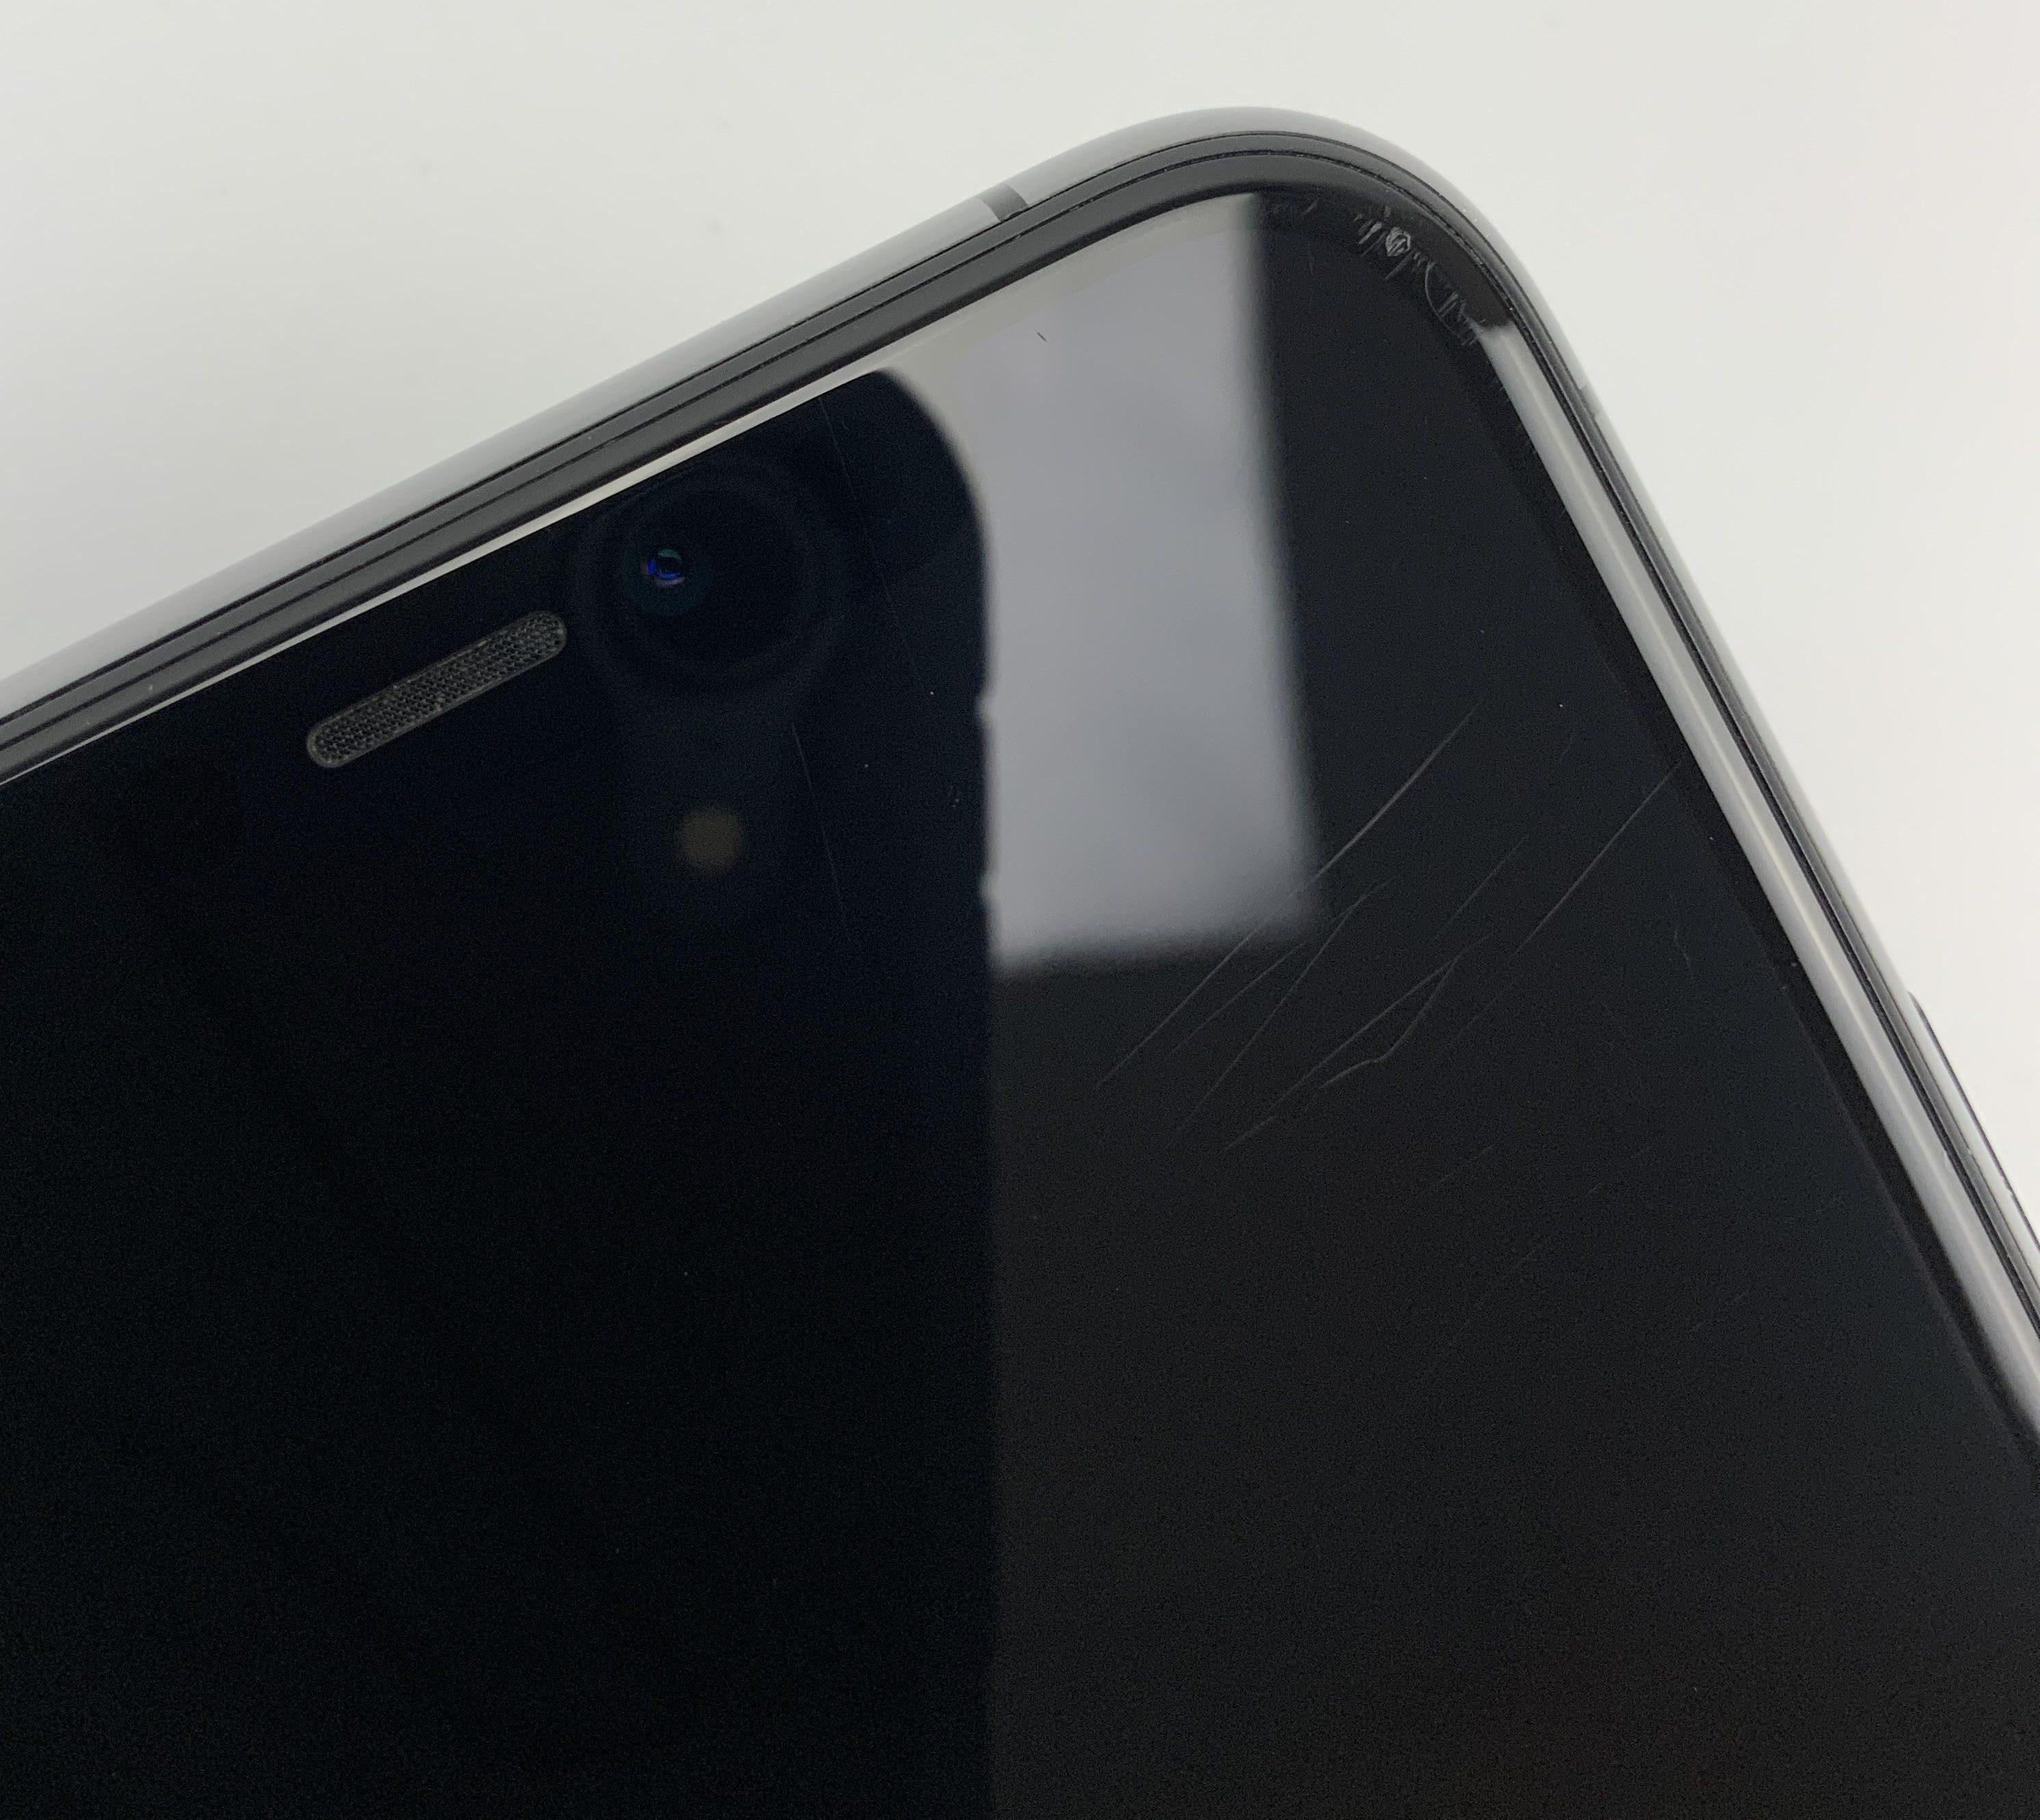 iPhone 11 Pro 64GB, 64GB, Space Gray, image 4